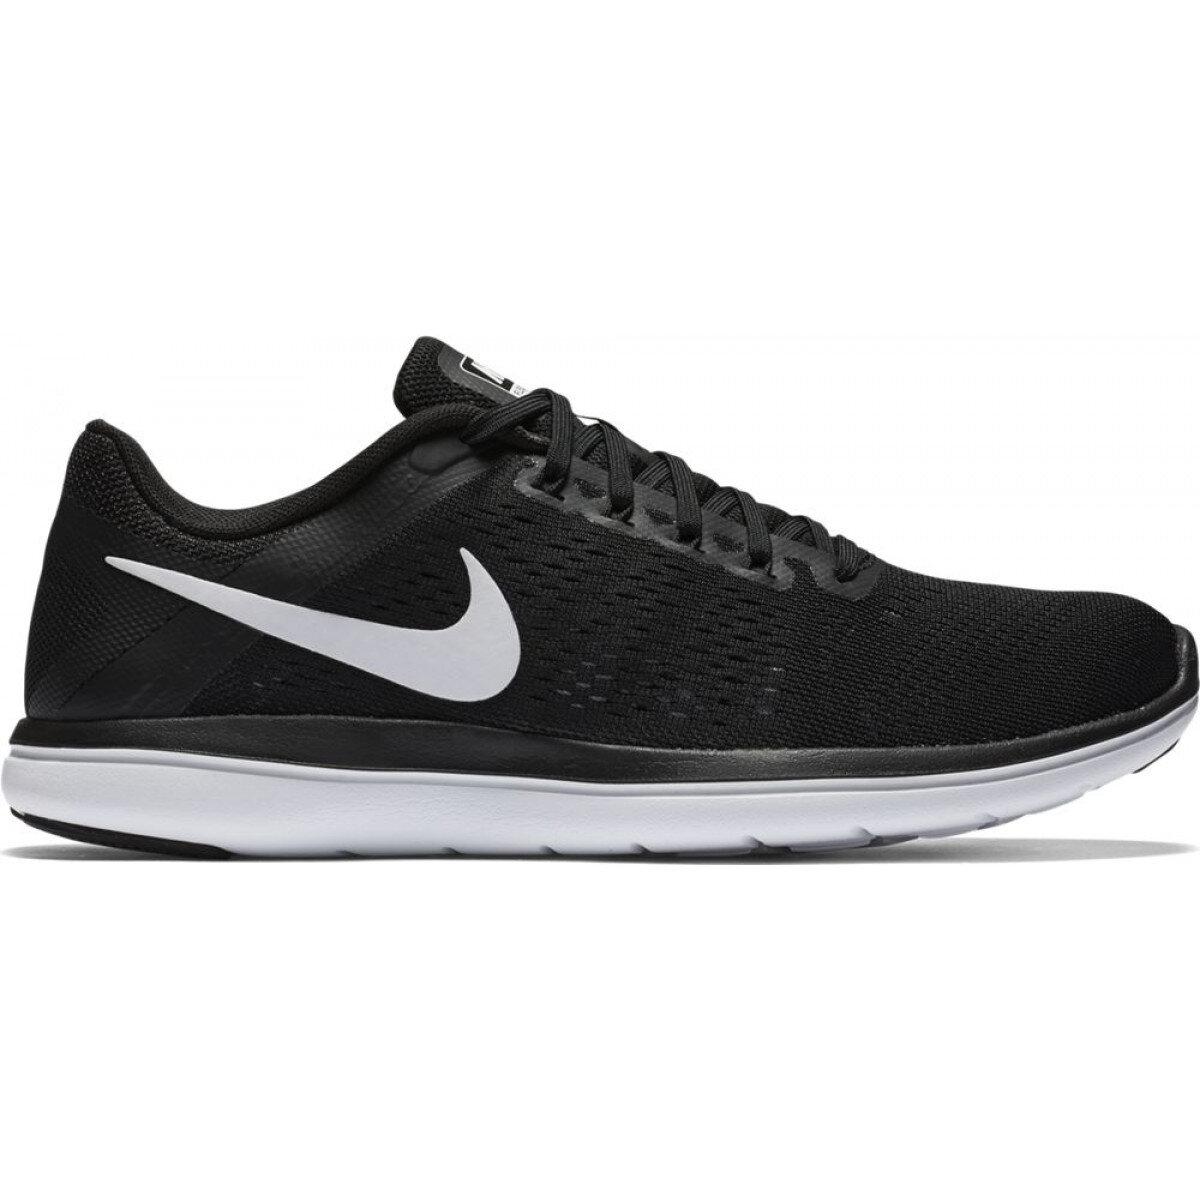 Nike Flex 2016 RN Women's Running Shoes